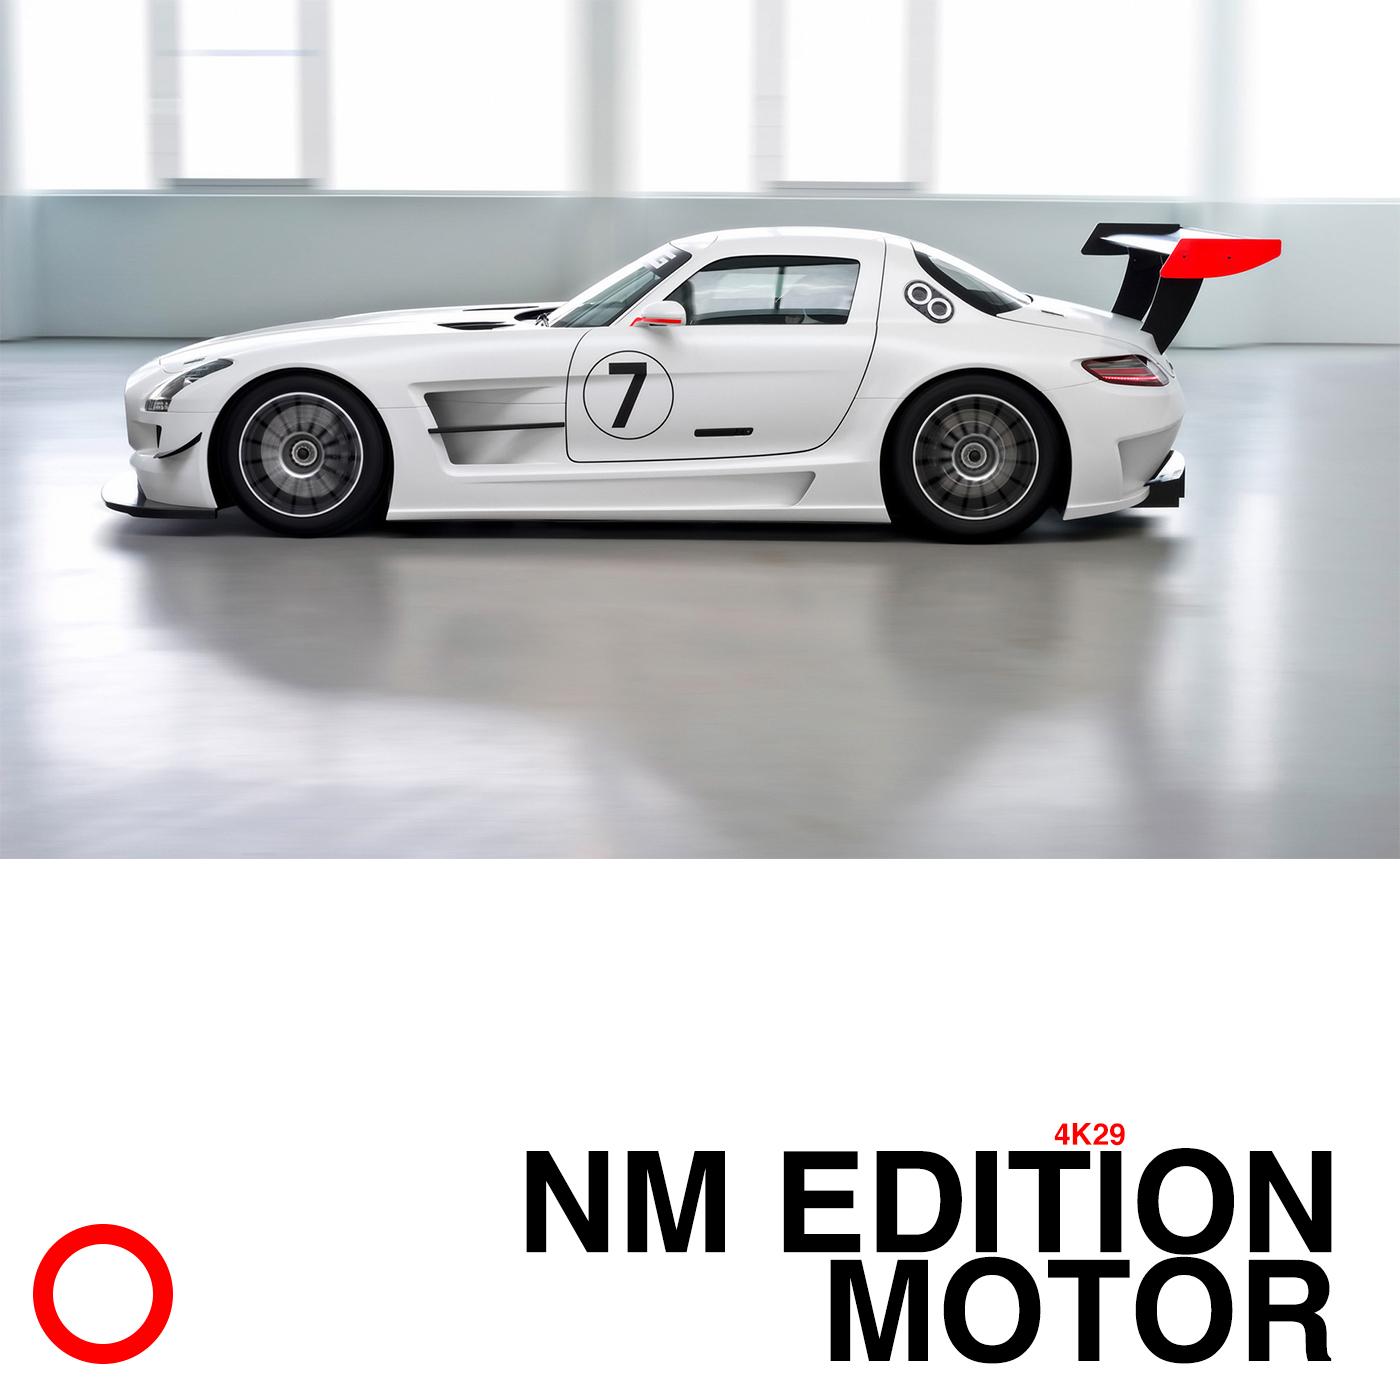 NM EDITION MOTOR 4K29